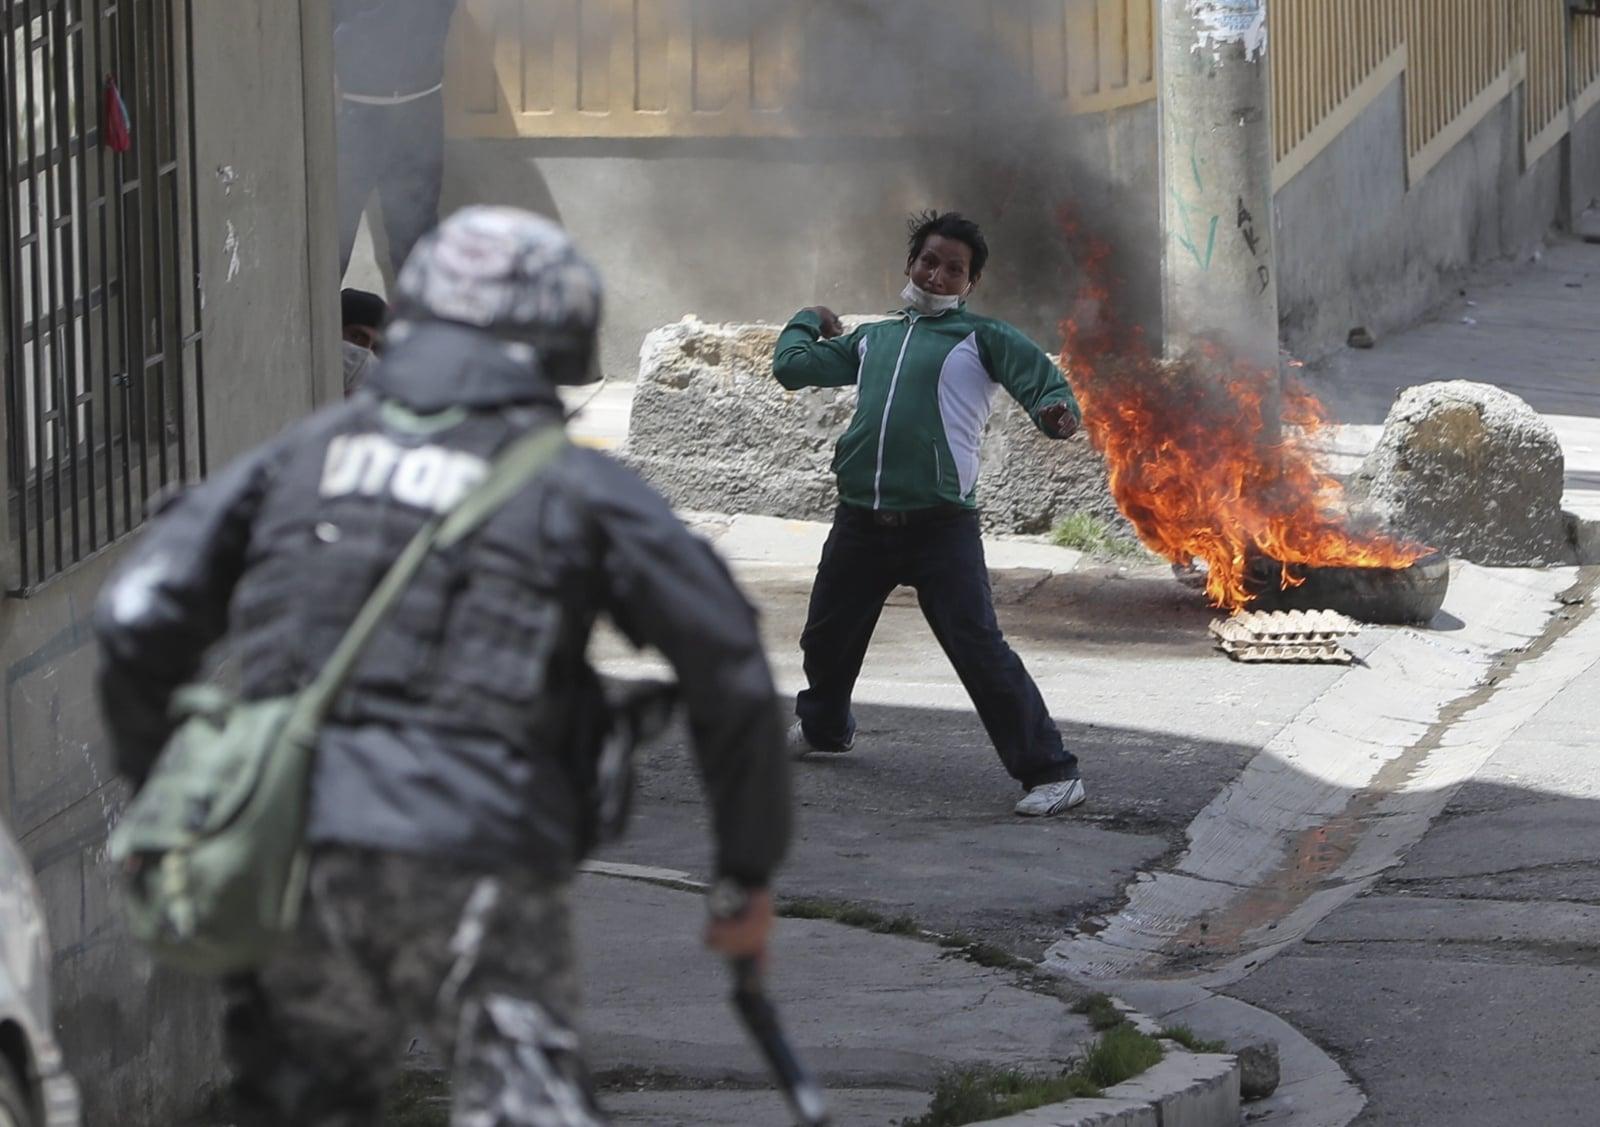 Protesty w Boliwii fot. Dostawca: PAP/EPA.